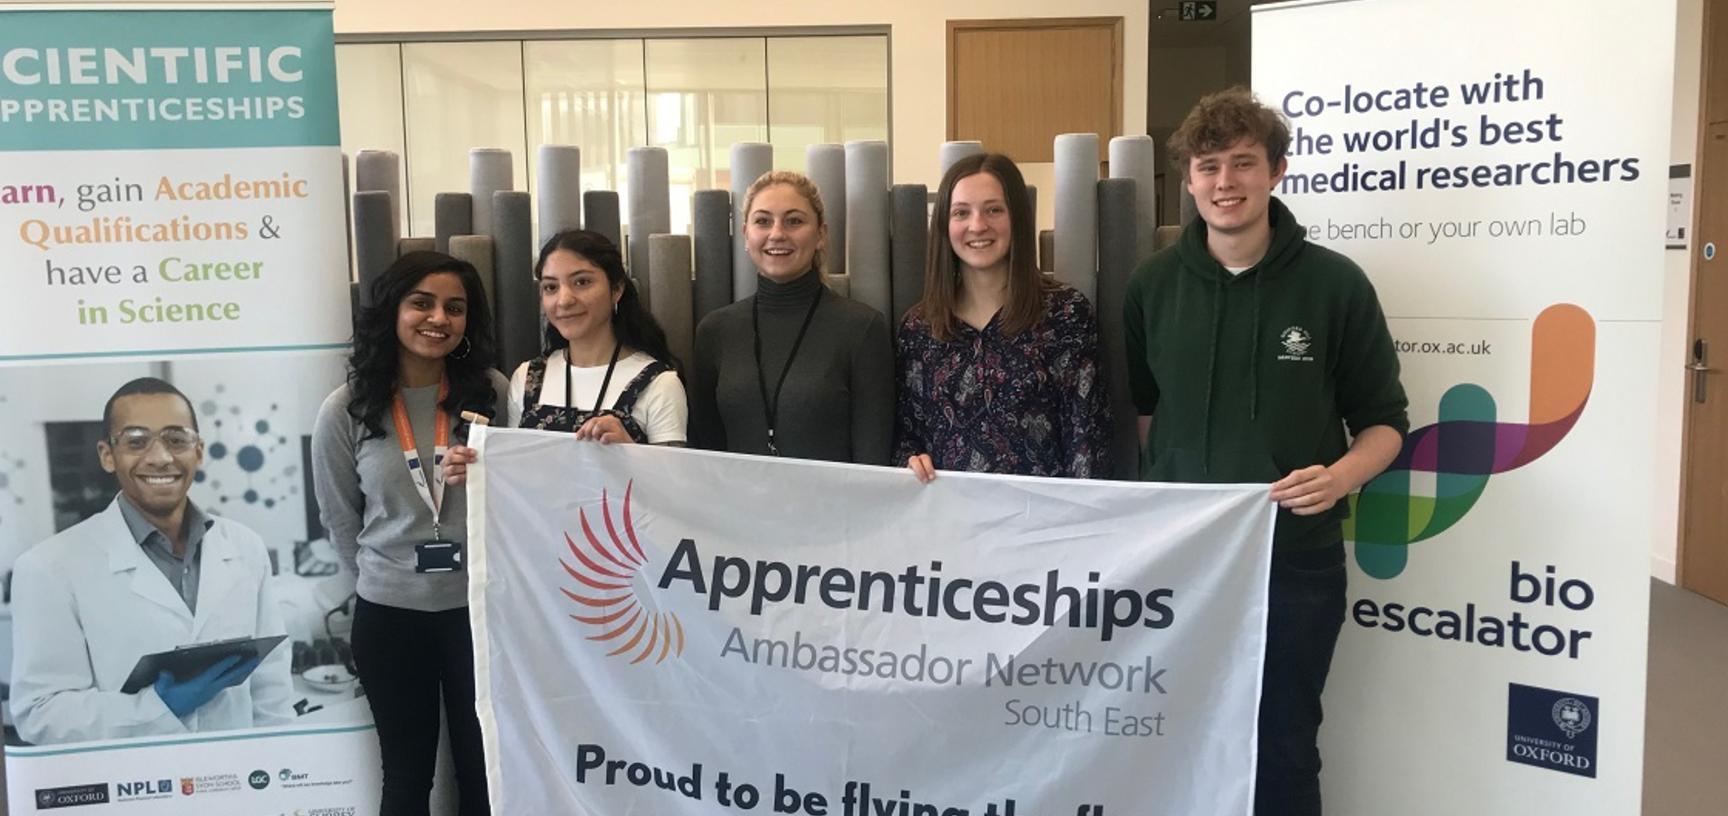 University laboratory technician apprentices holding the Apprenticeship ambassador flag during National Apprenticeship Week 2019